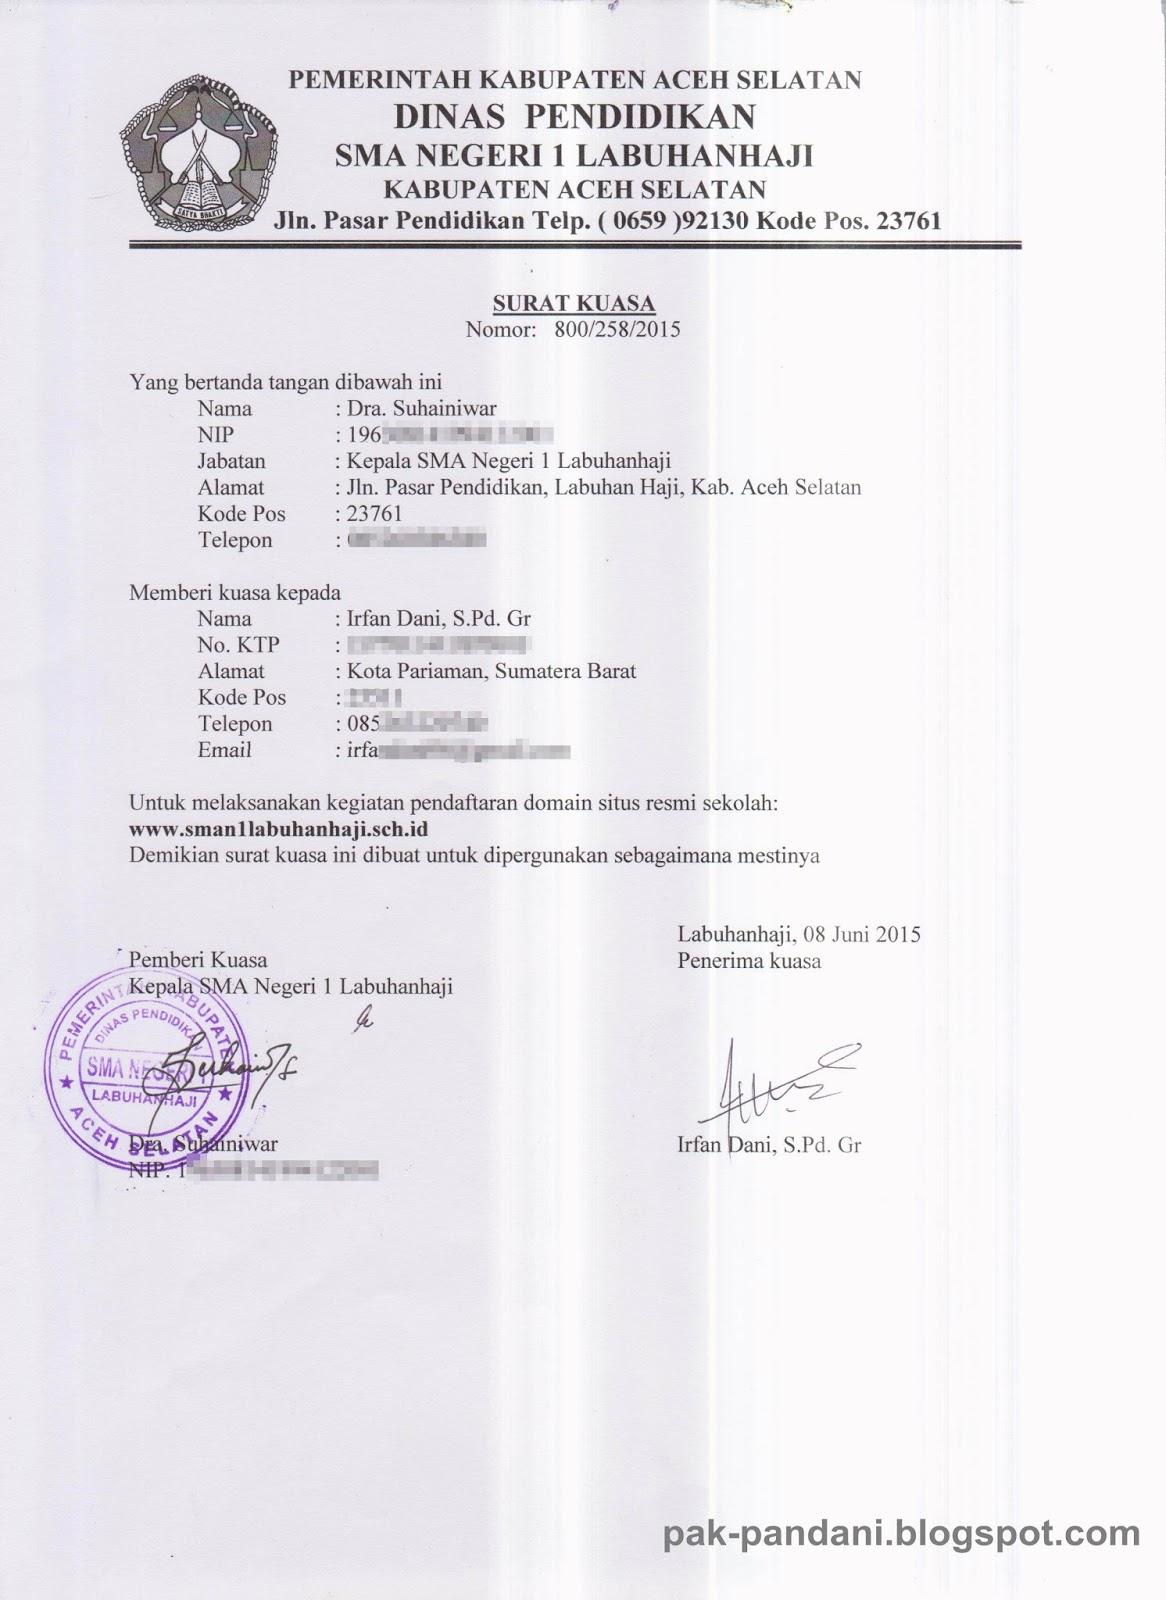 Contoh Surat Kuasa Domian Sekolah Schid Pak Pandani